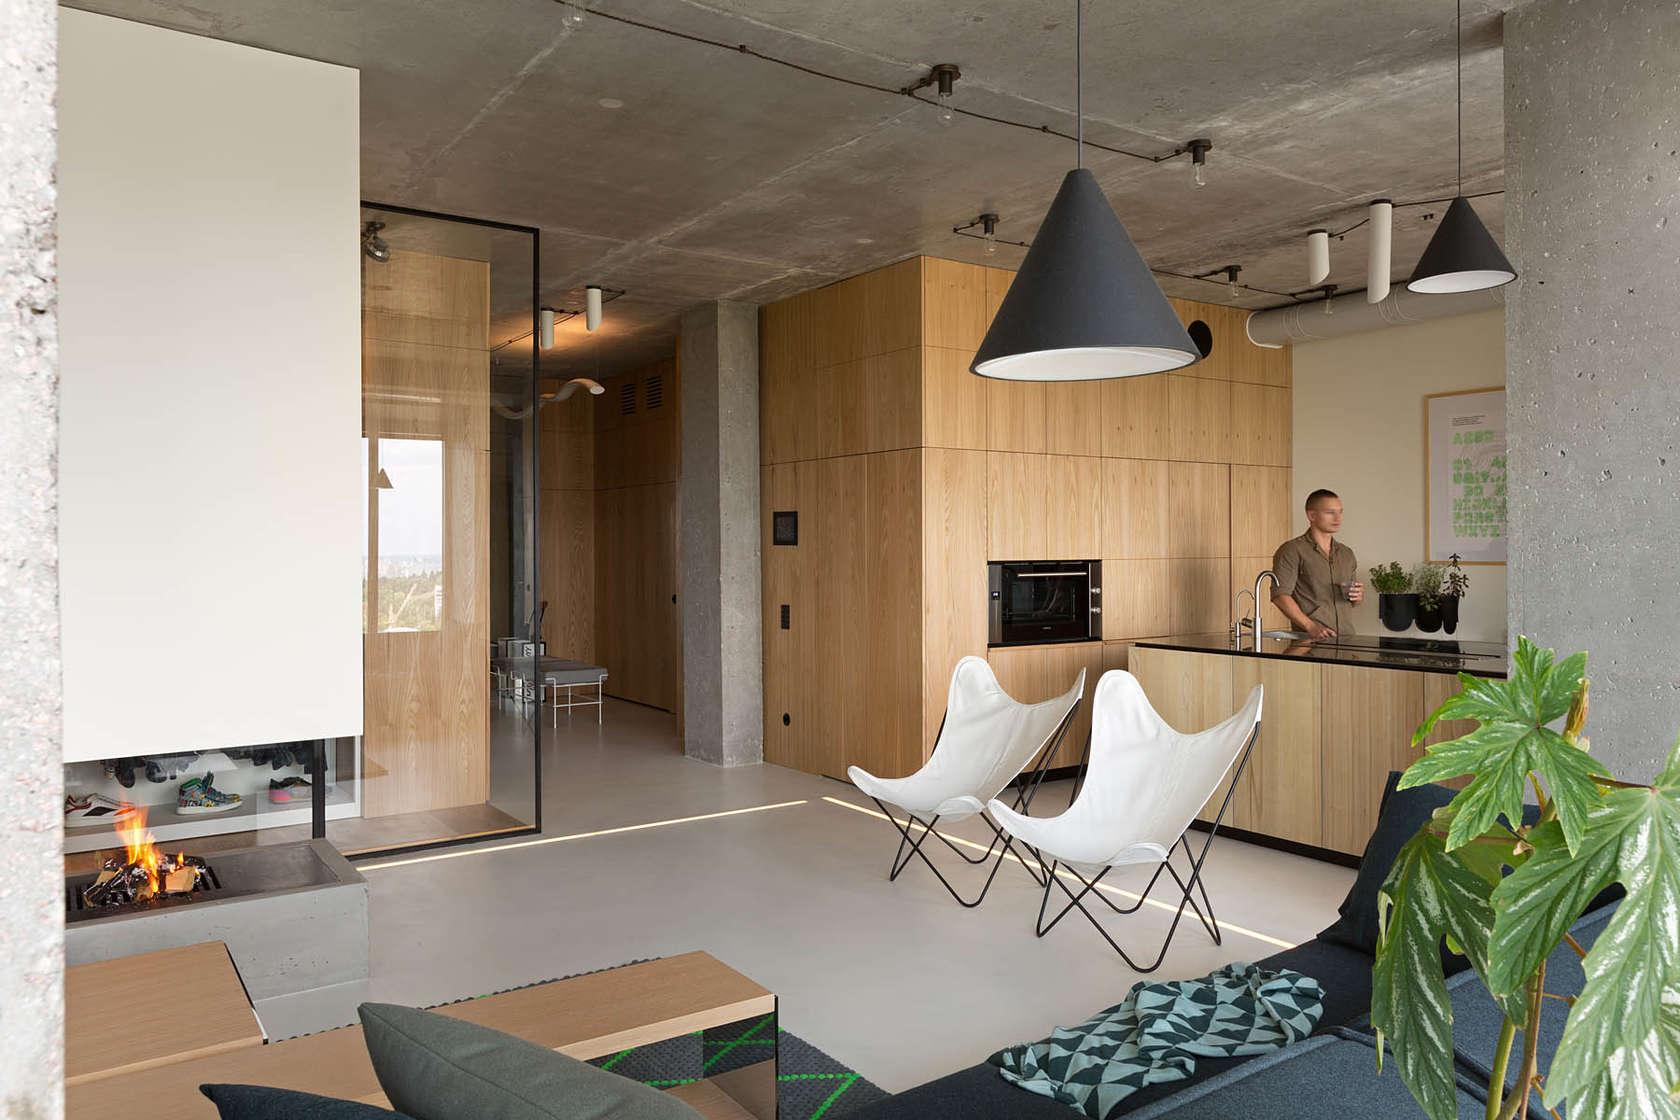 Inspiring penthouse design with minimalist concept